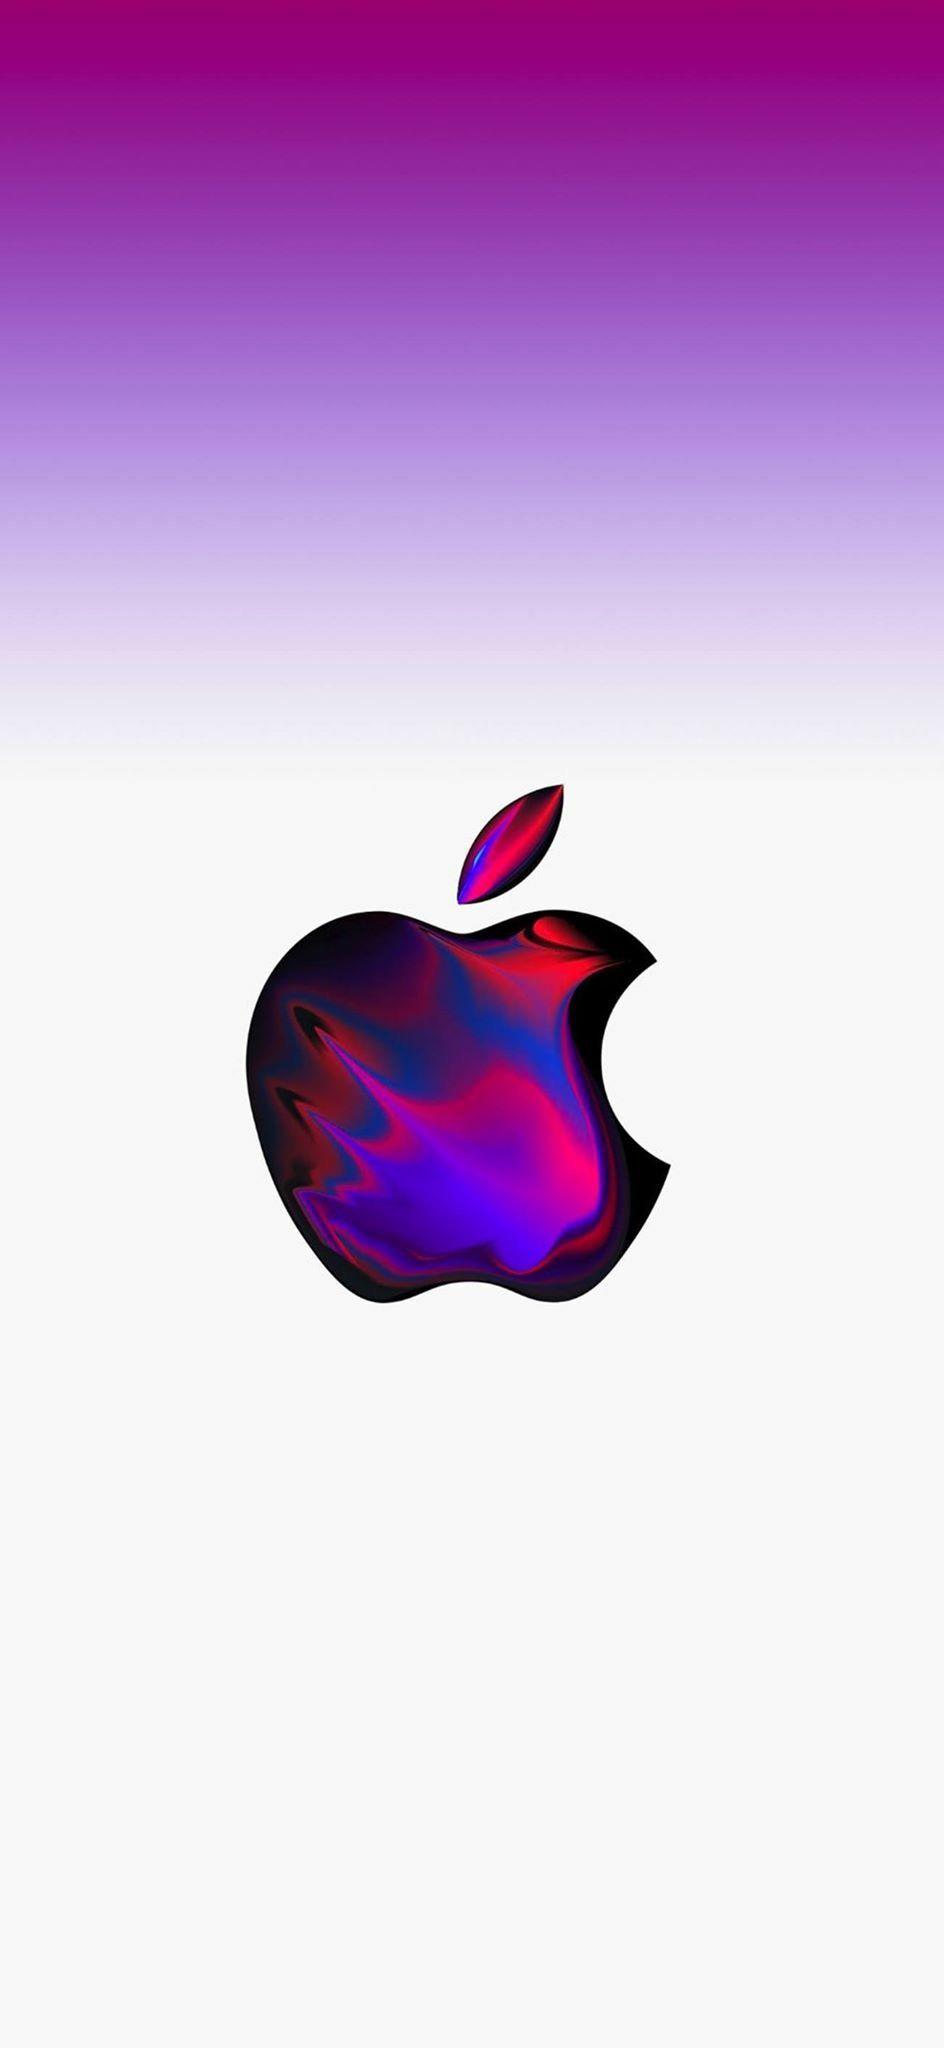 Pin By Greg Biggs On Wallpaper Apple Wallpaper Iphone Apple Logo Wallpaper Iphone Apple Logo Wallpaper